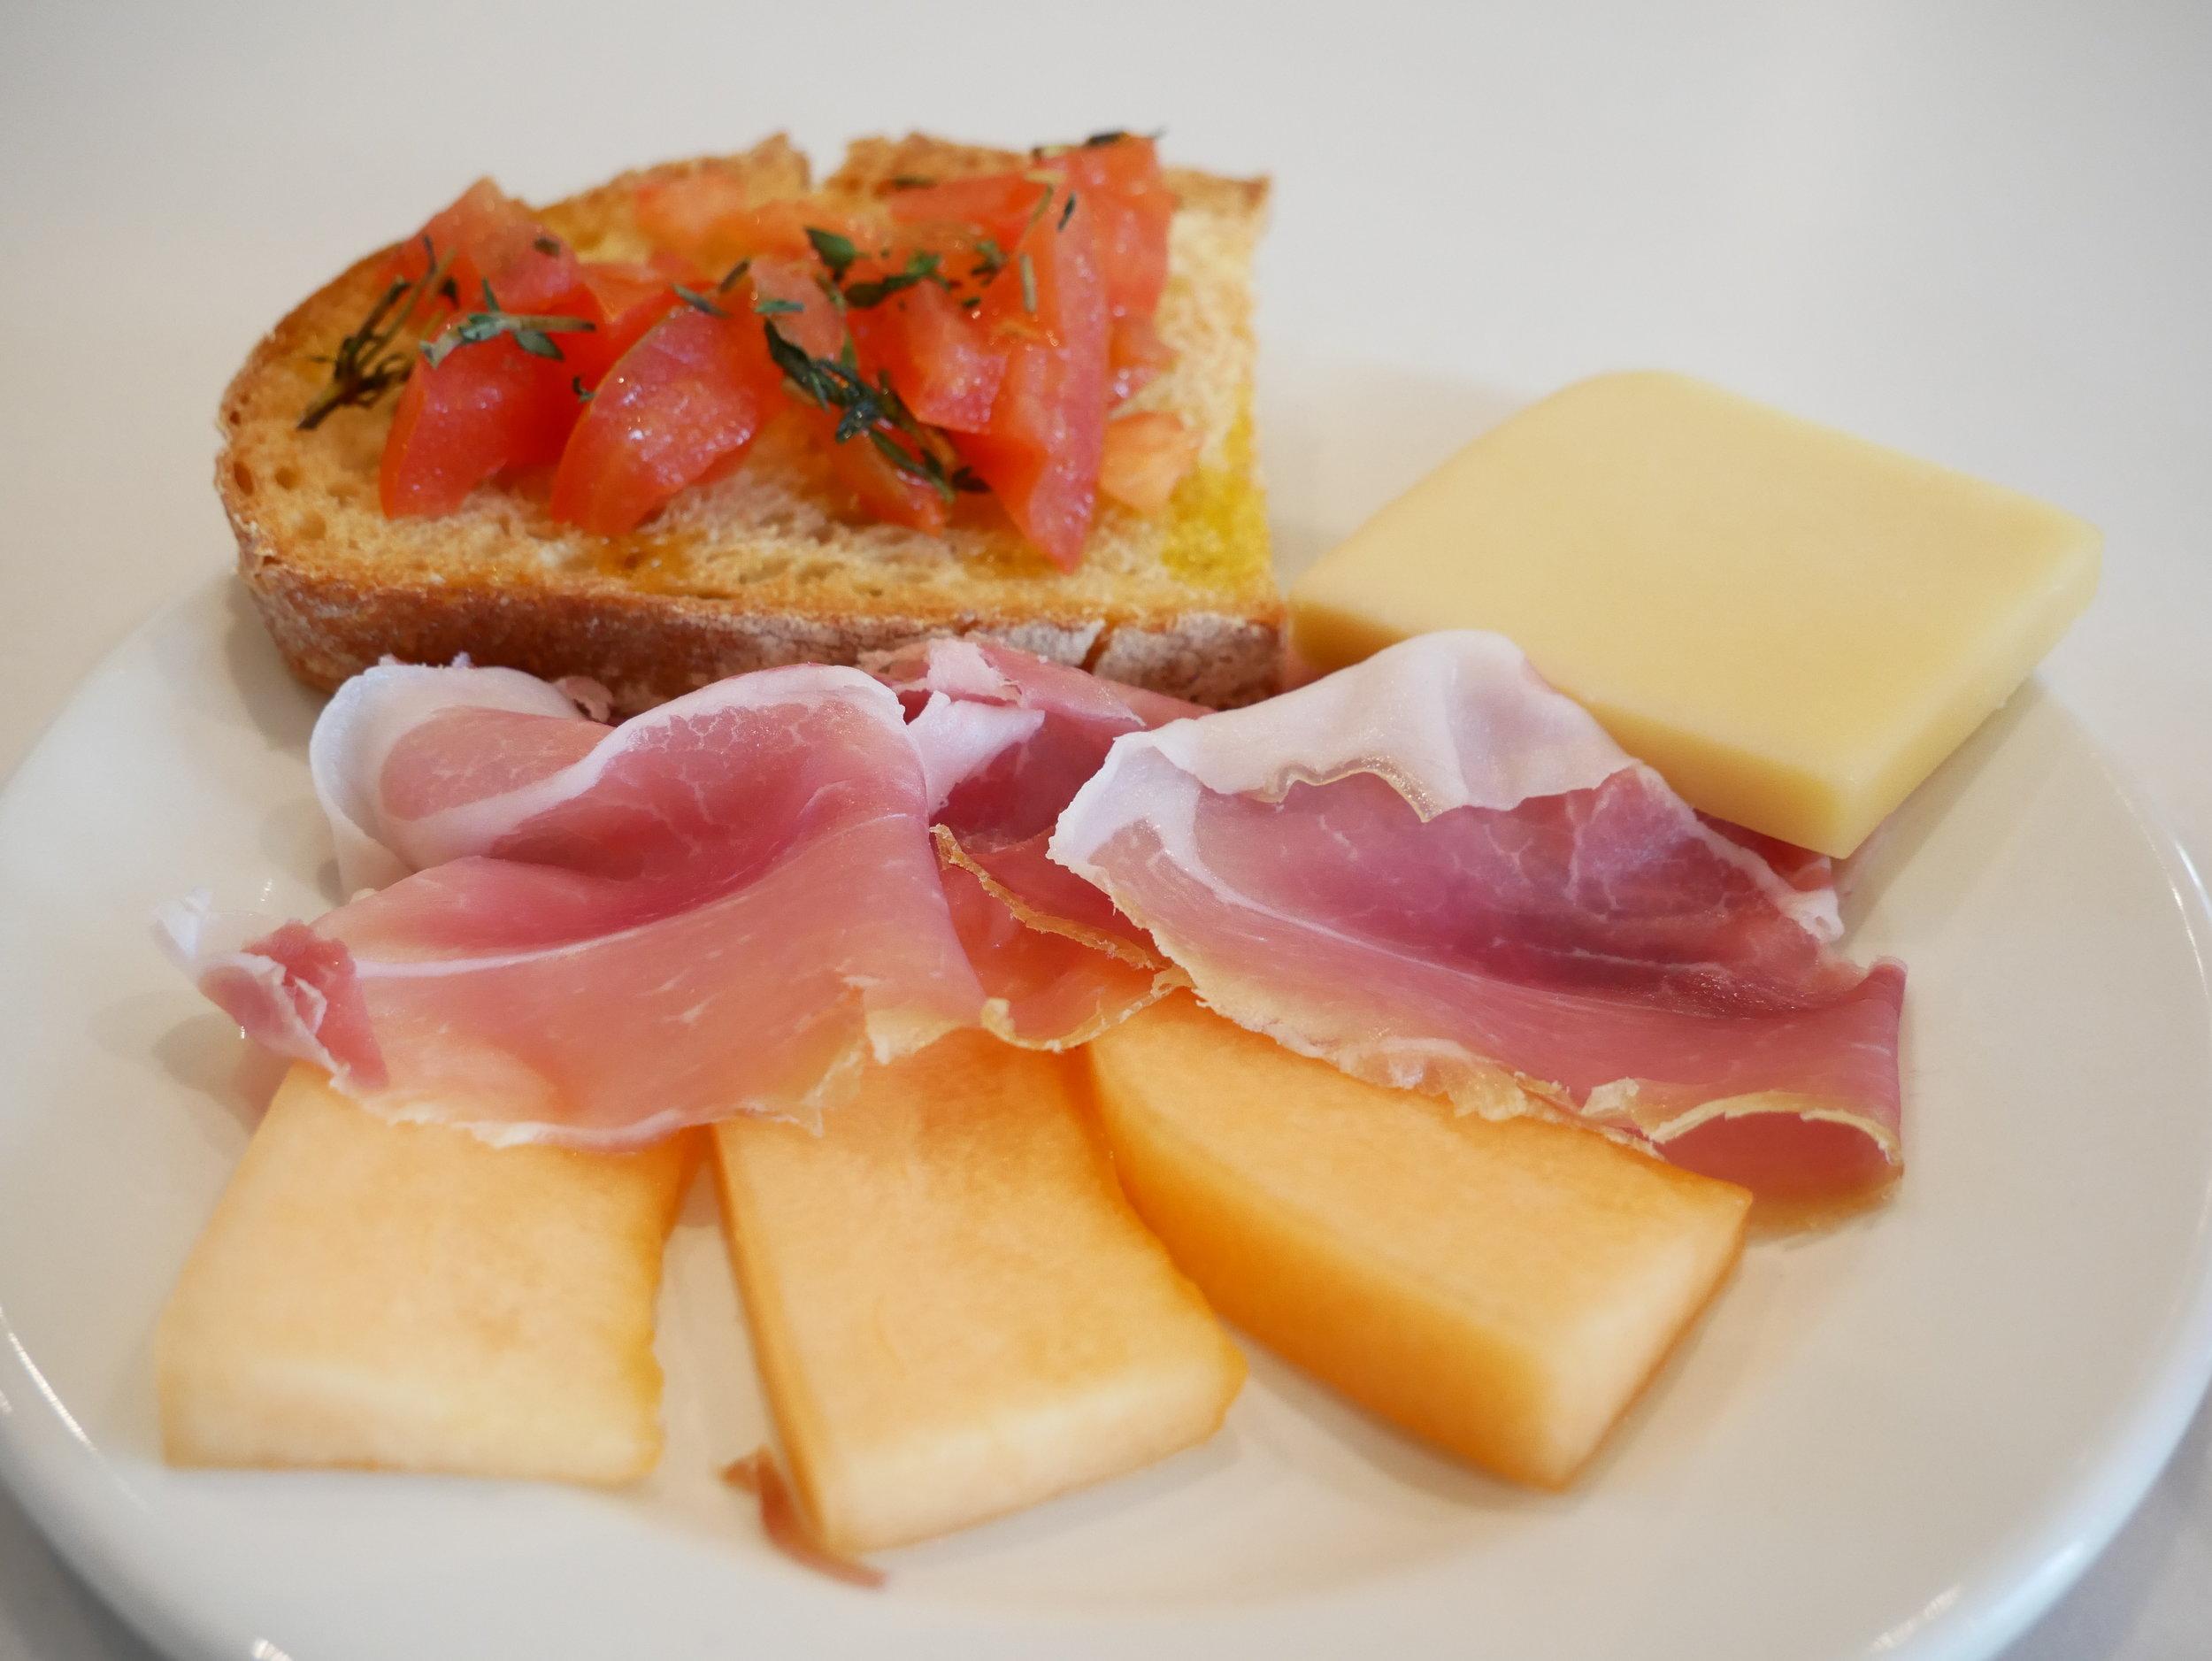 Milan Lufthansa Lounge prosciutto, melon, bruschetta